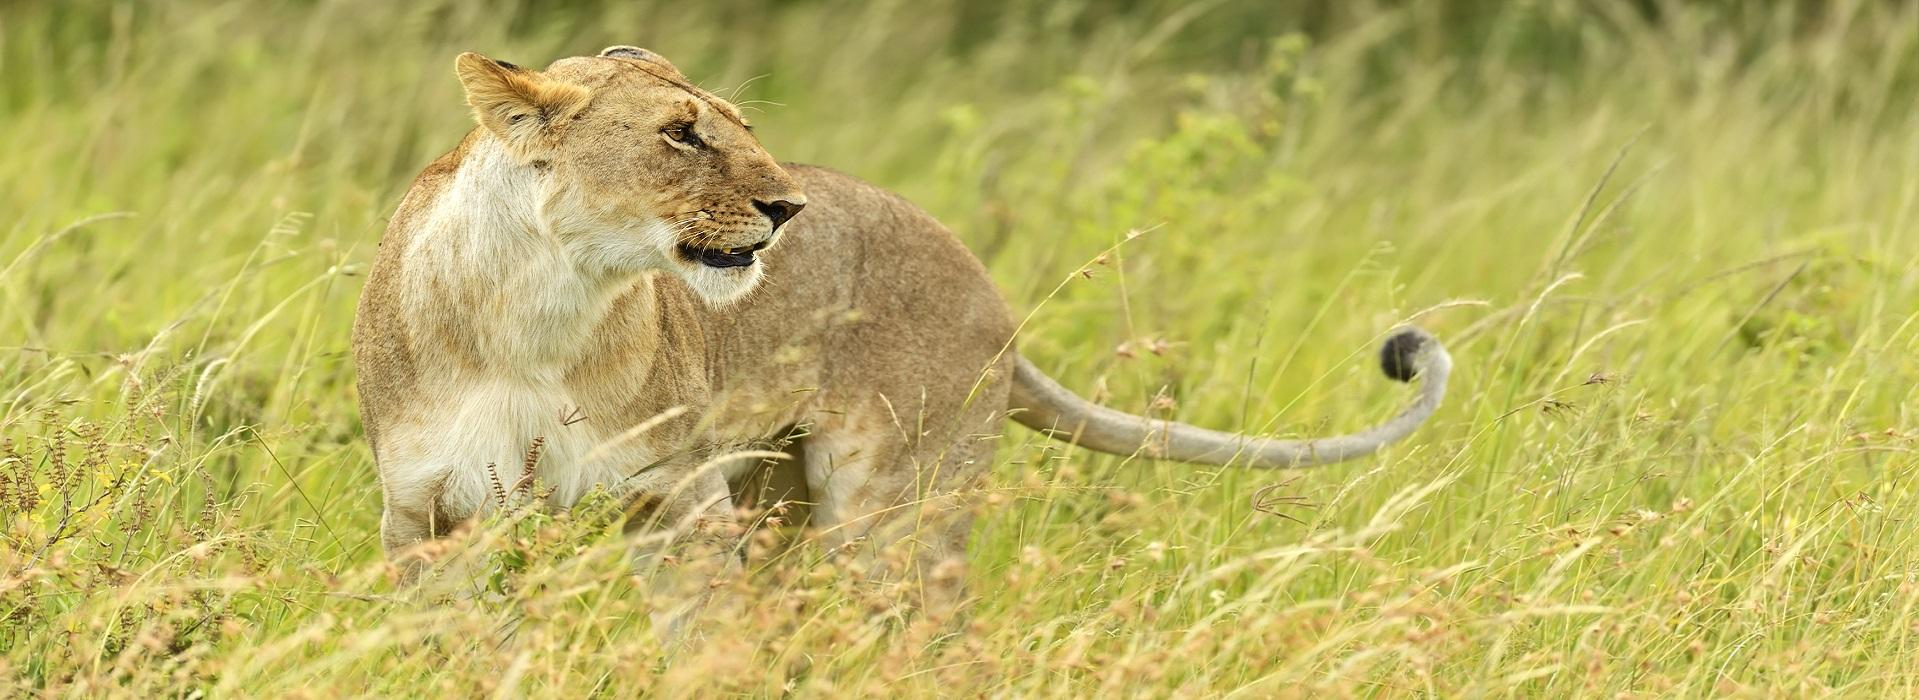 The Ultimate Safari - African Adventure Safaris